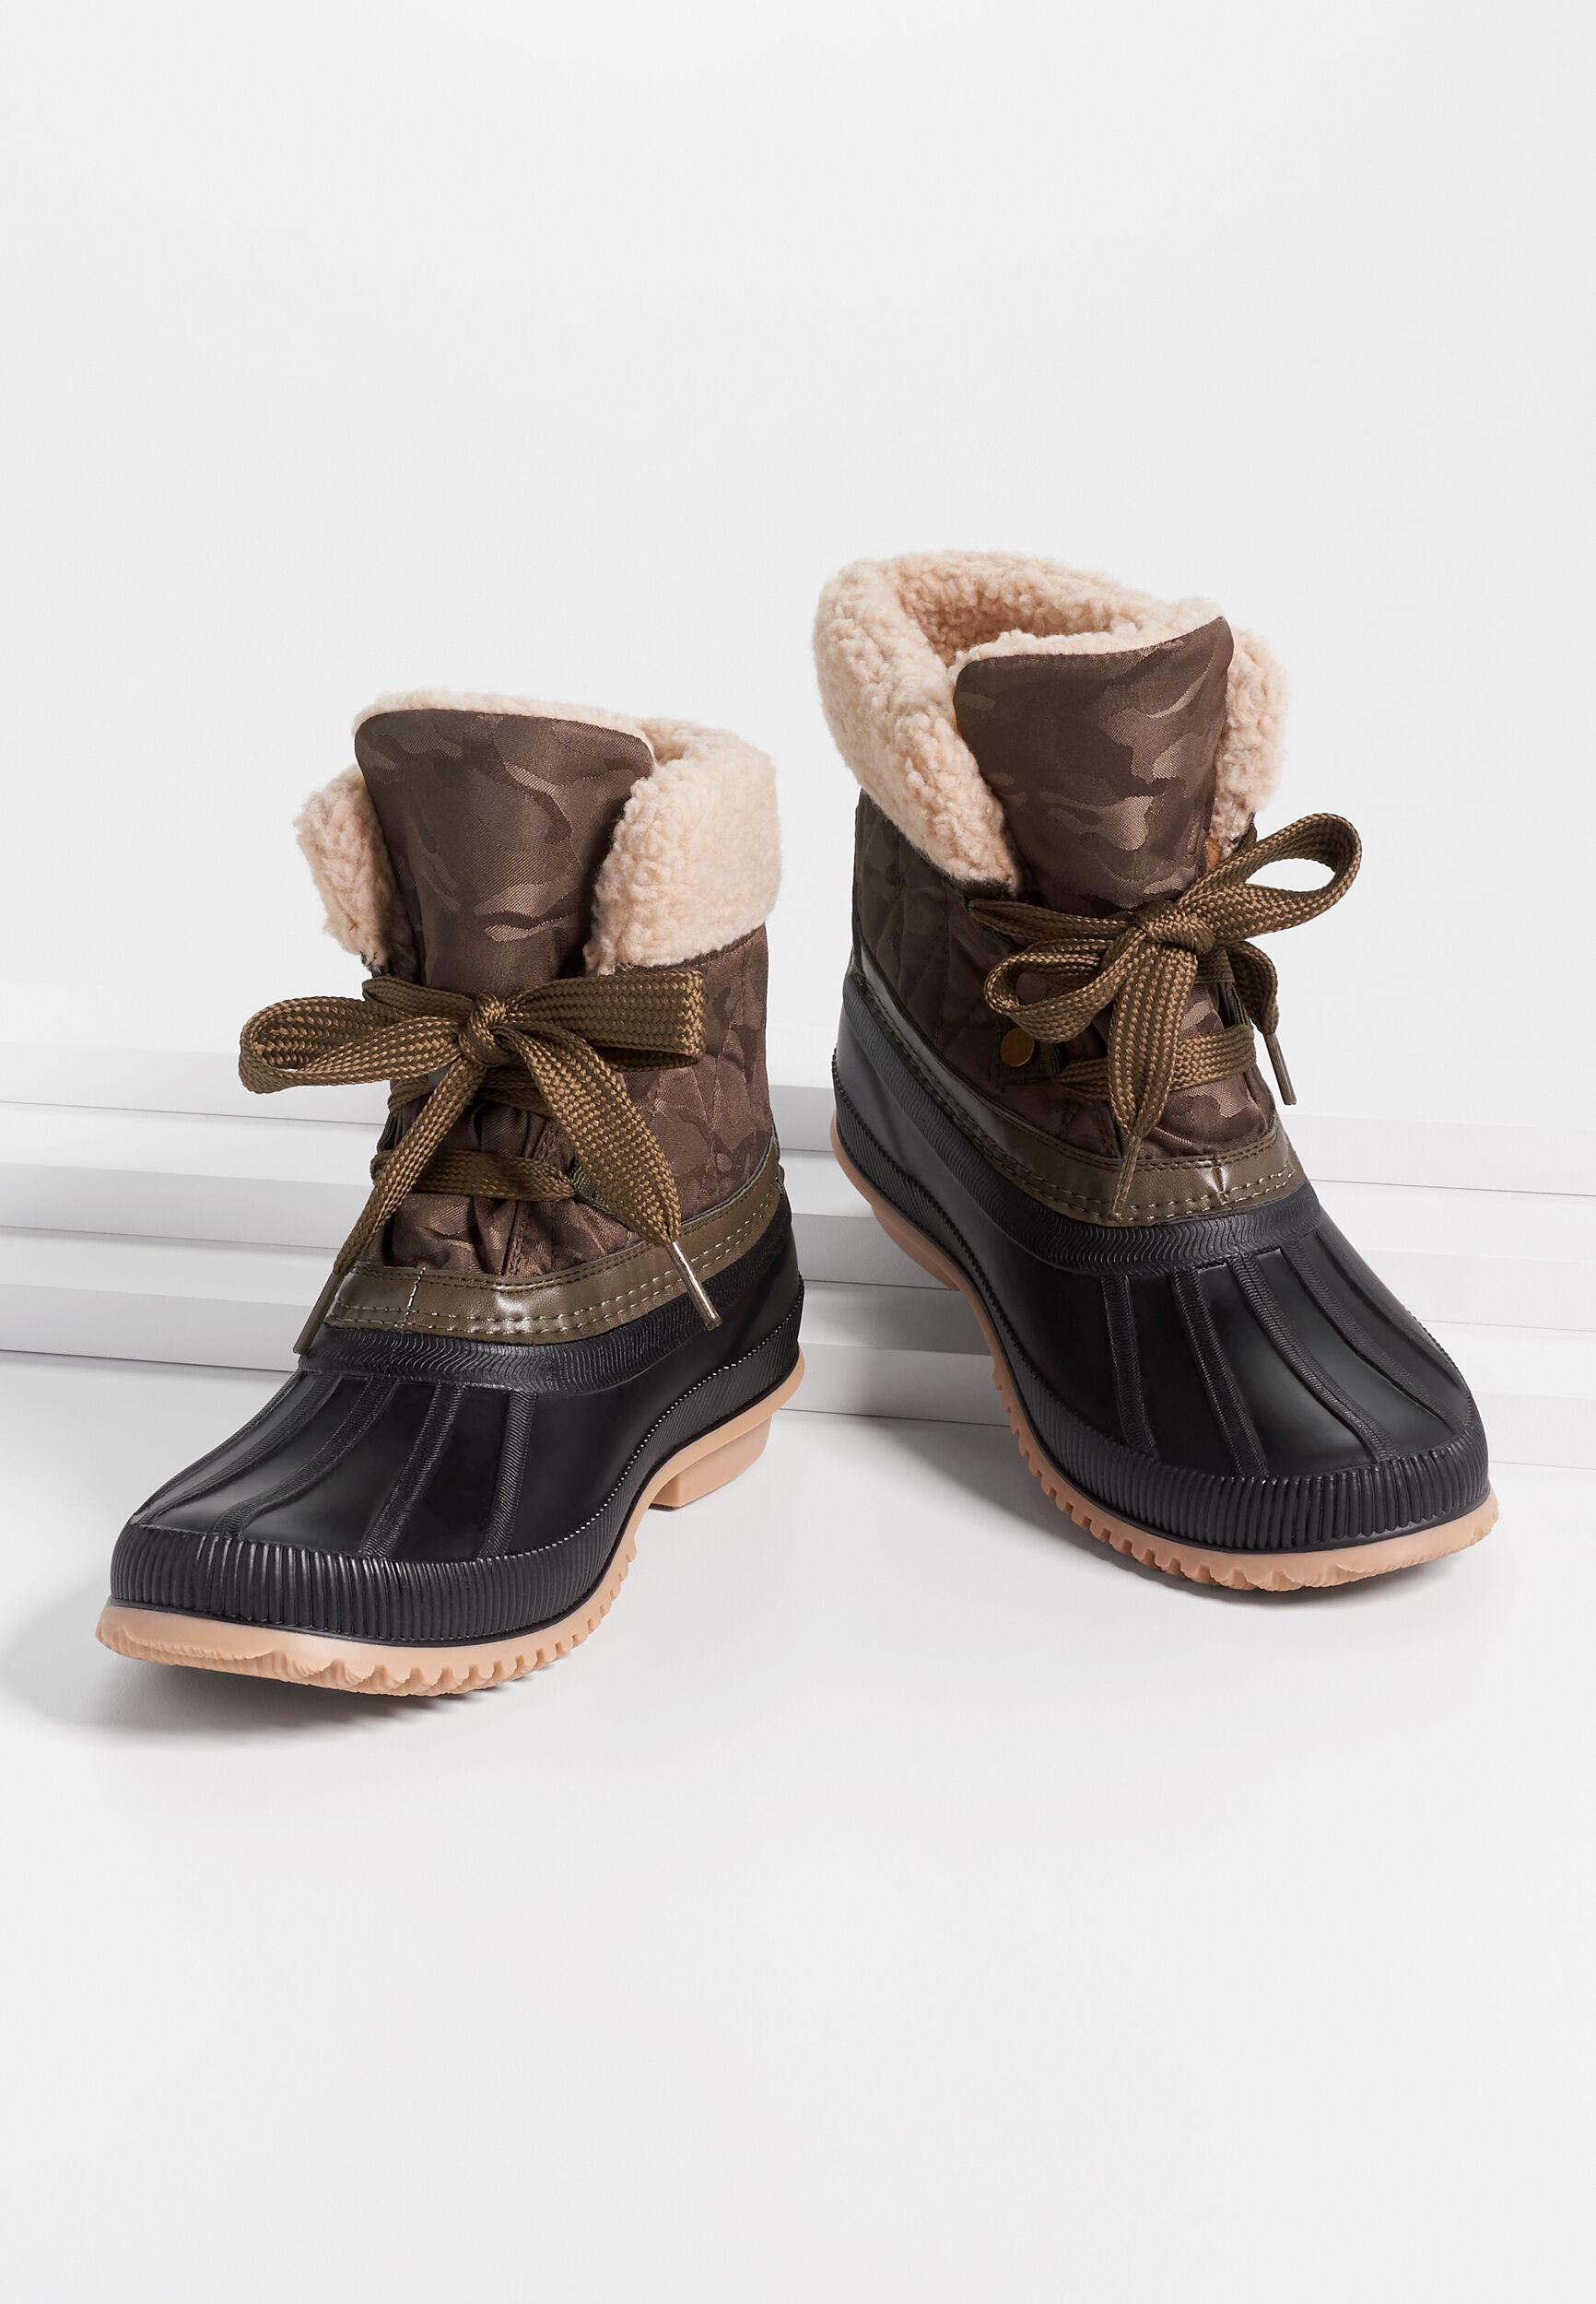 Maurices Womens Jessie Camo Sherpa Collar Duck Boot Green  -  7 1/2